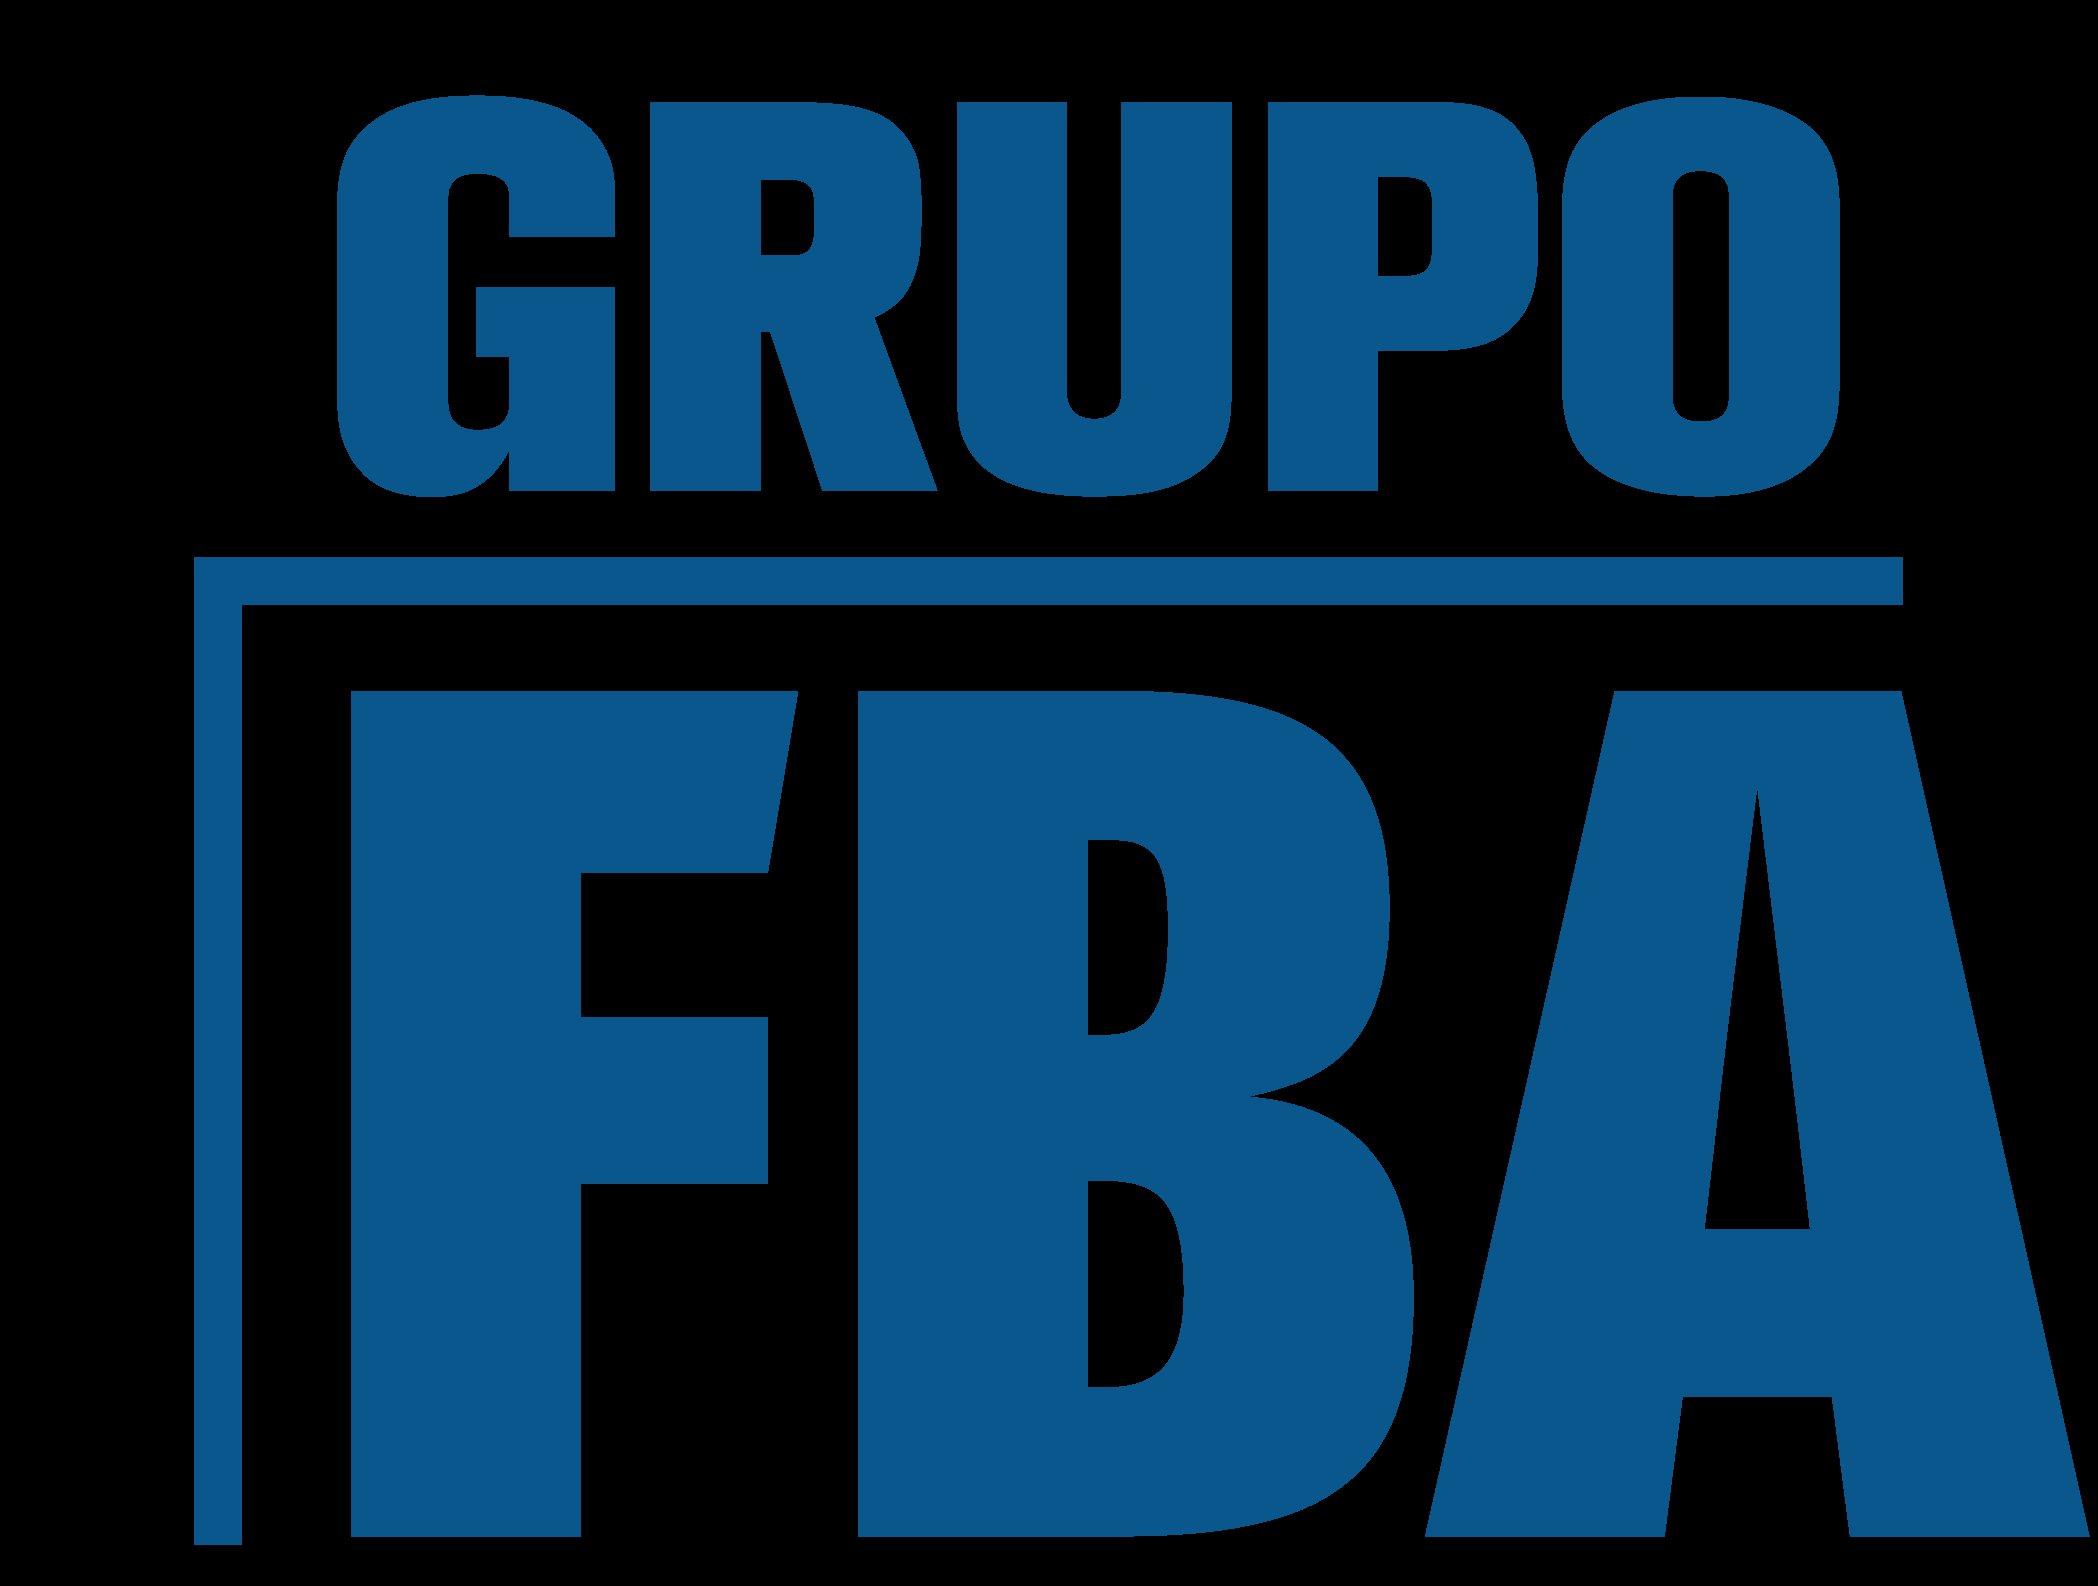 Grupo FBA